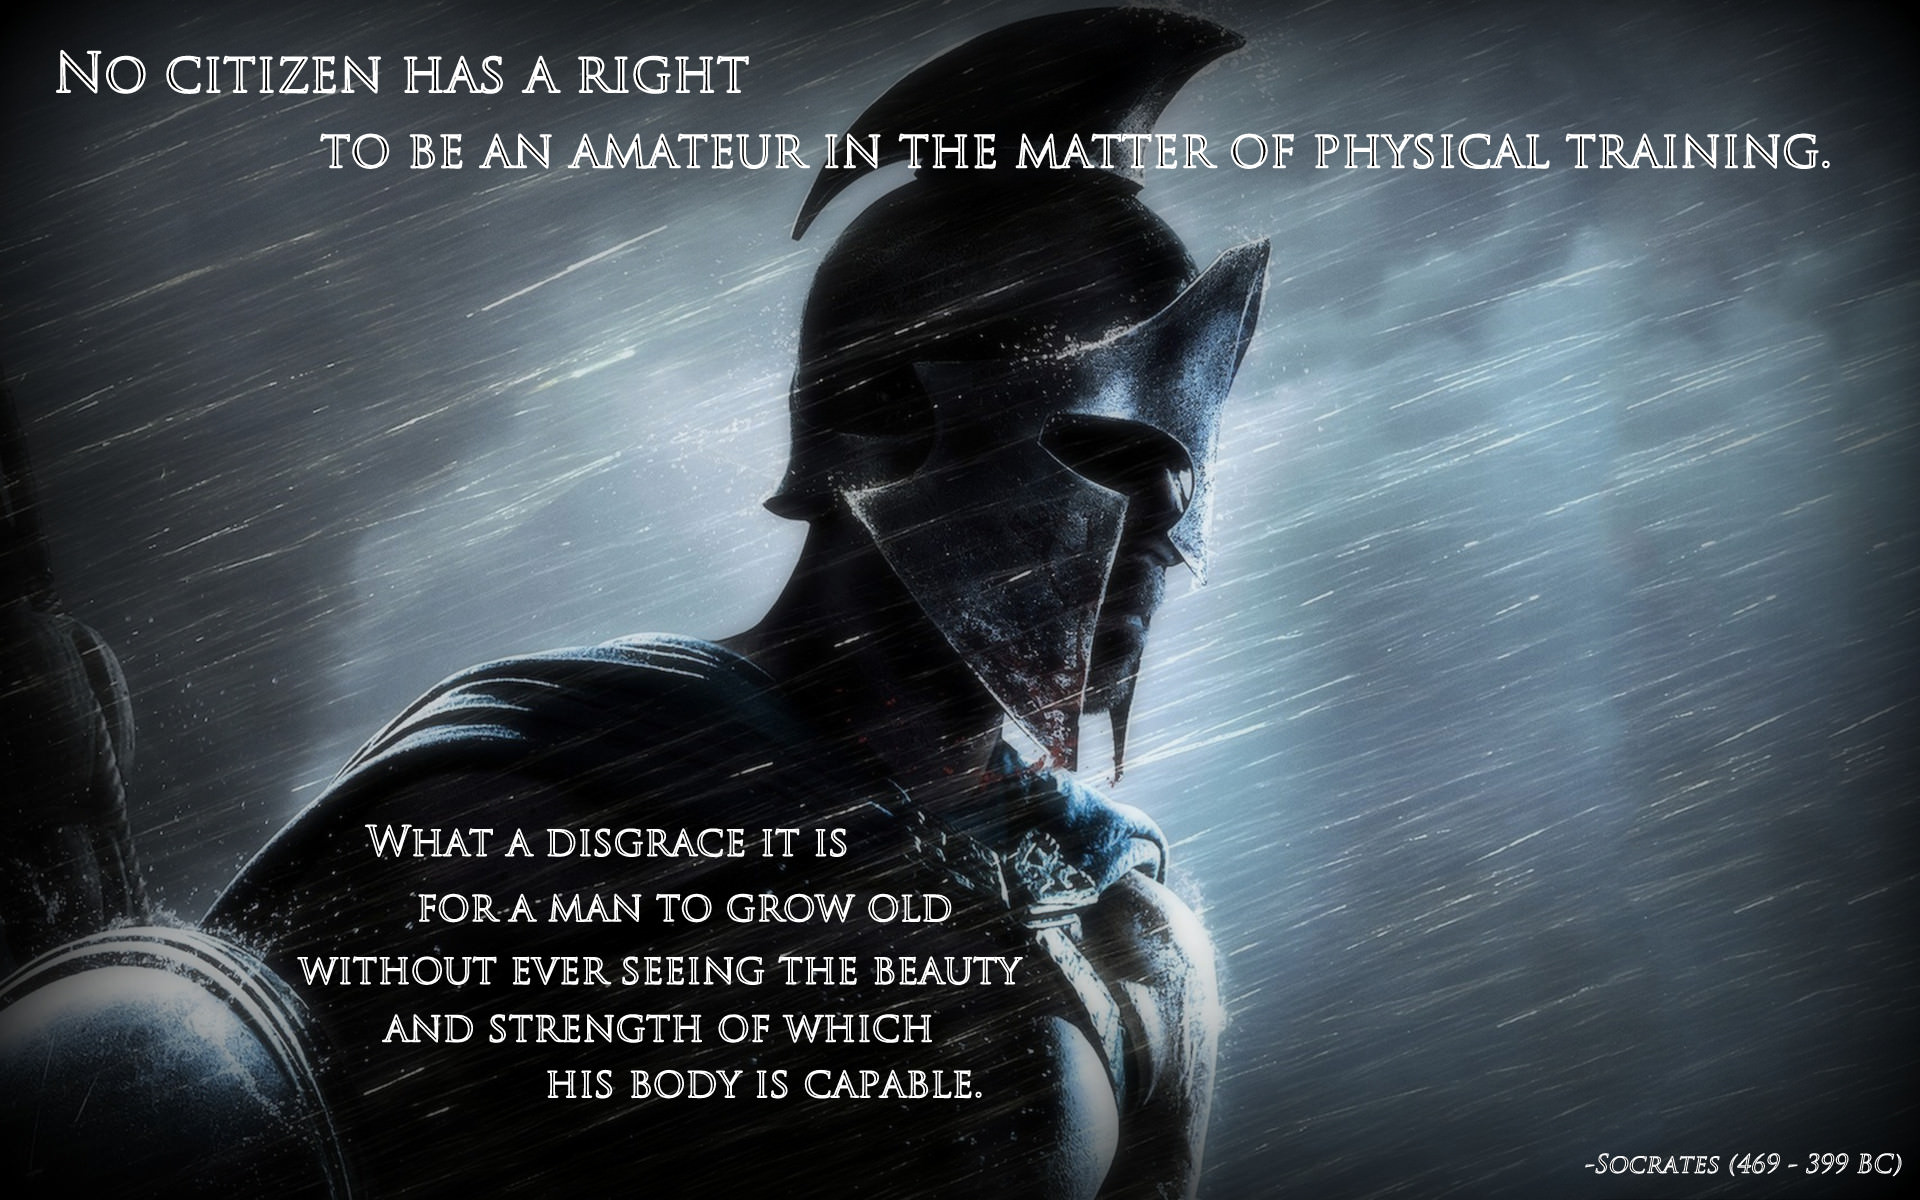 [Image] My favorite Socrates quote.